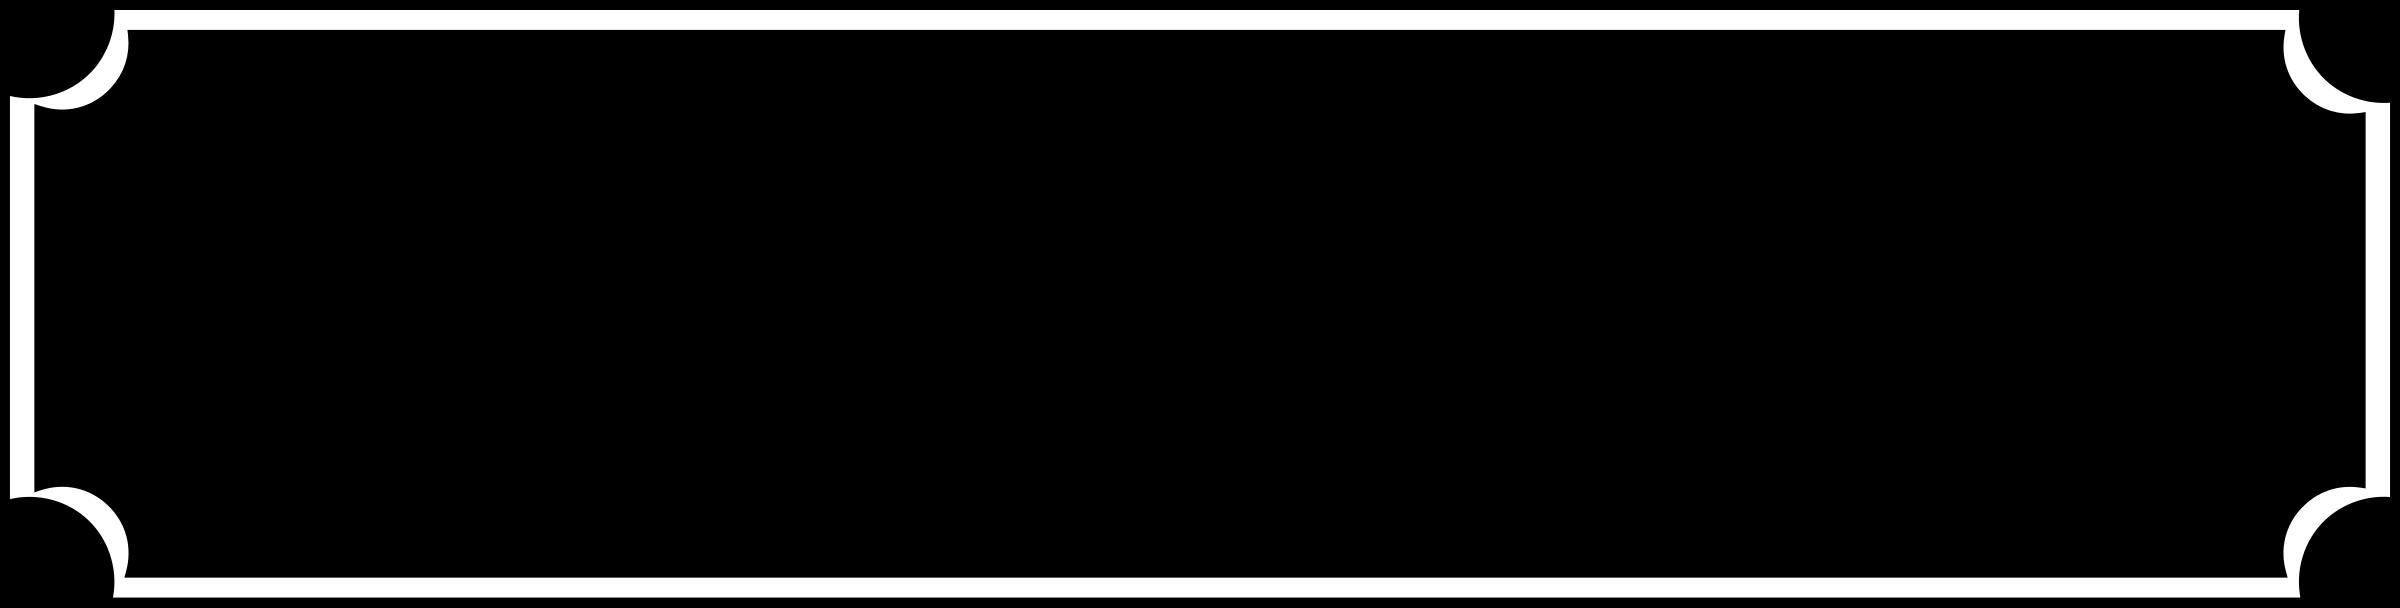 Clipart - Empty Banner